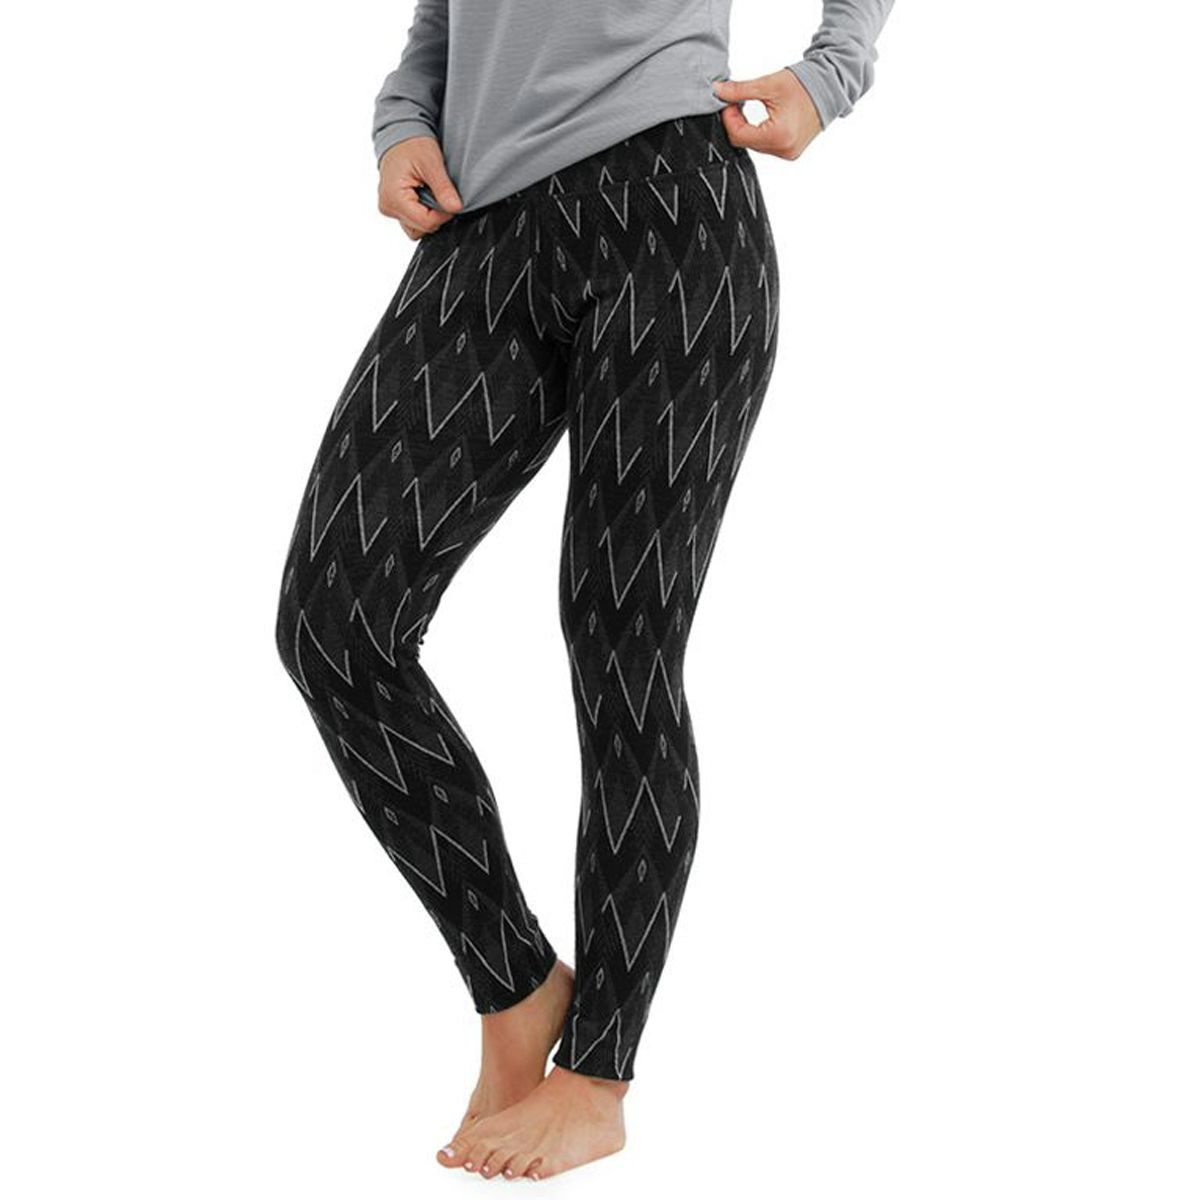 Smartwool Midweight Pattern Bottom - Women's